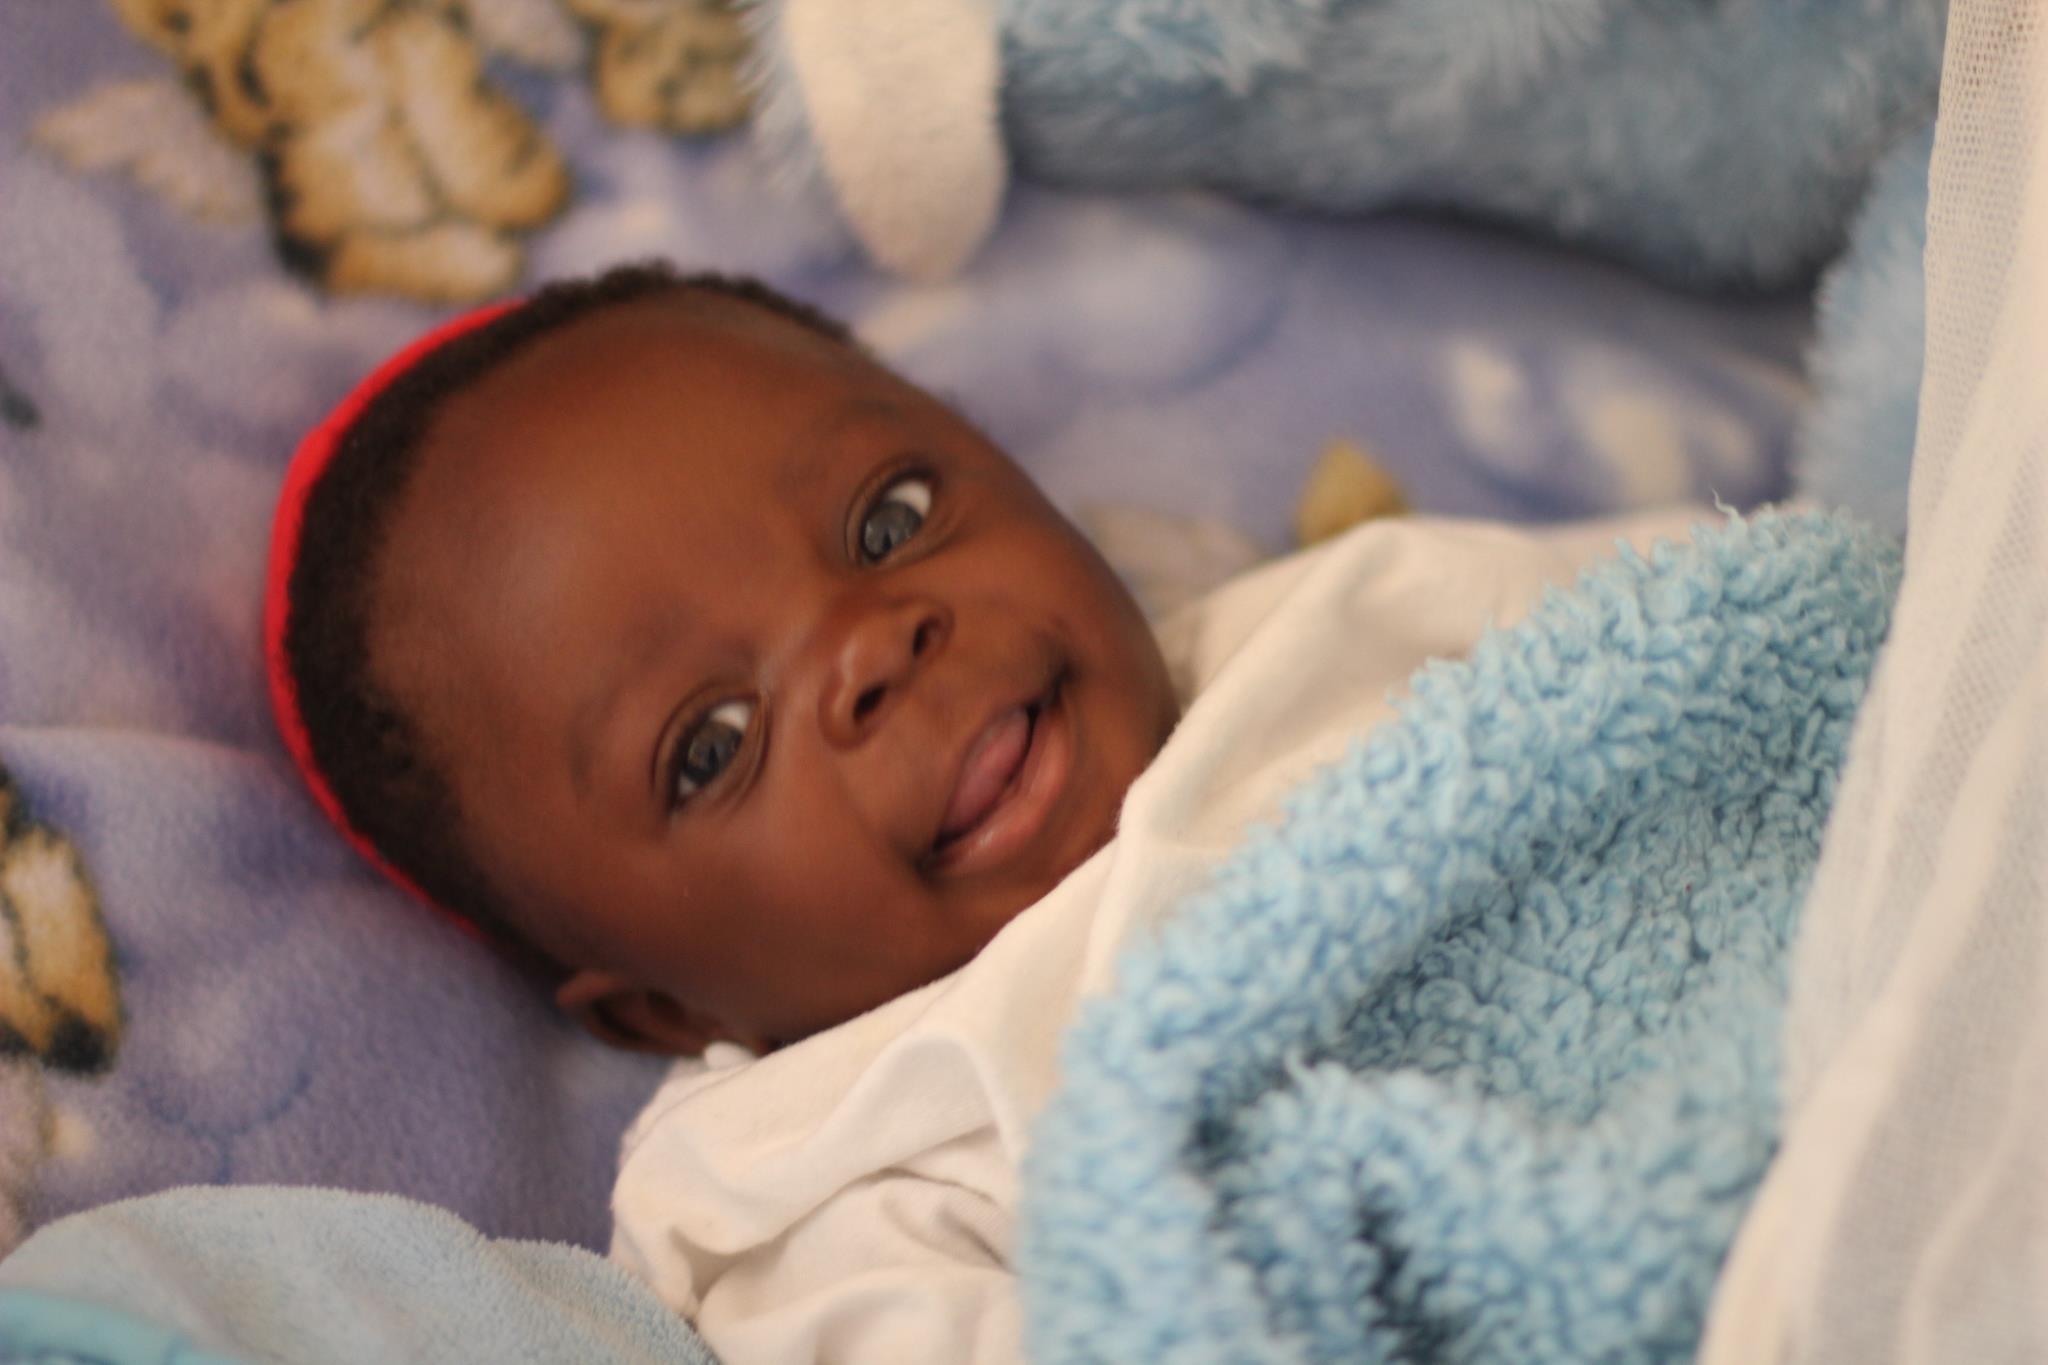 Uganda develops foot measurement to tackle premature birth risks